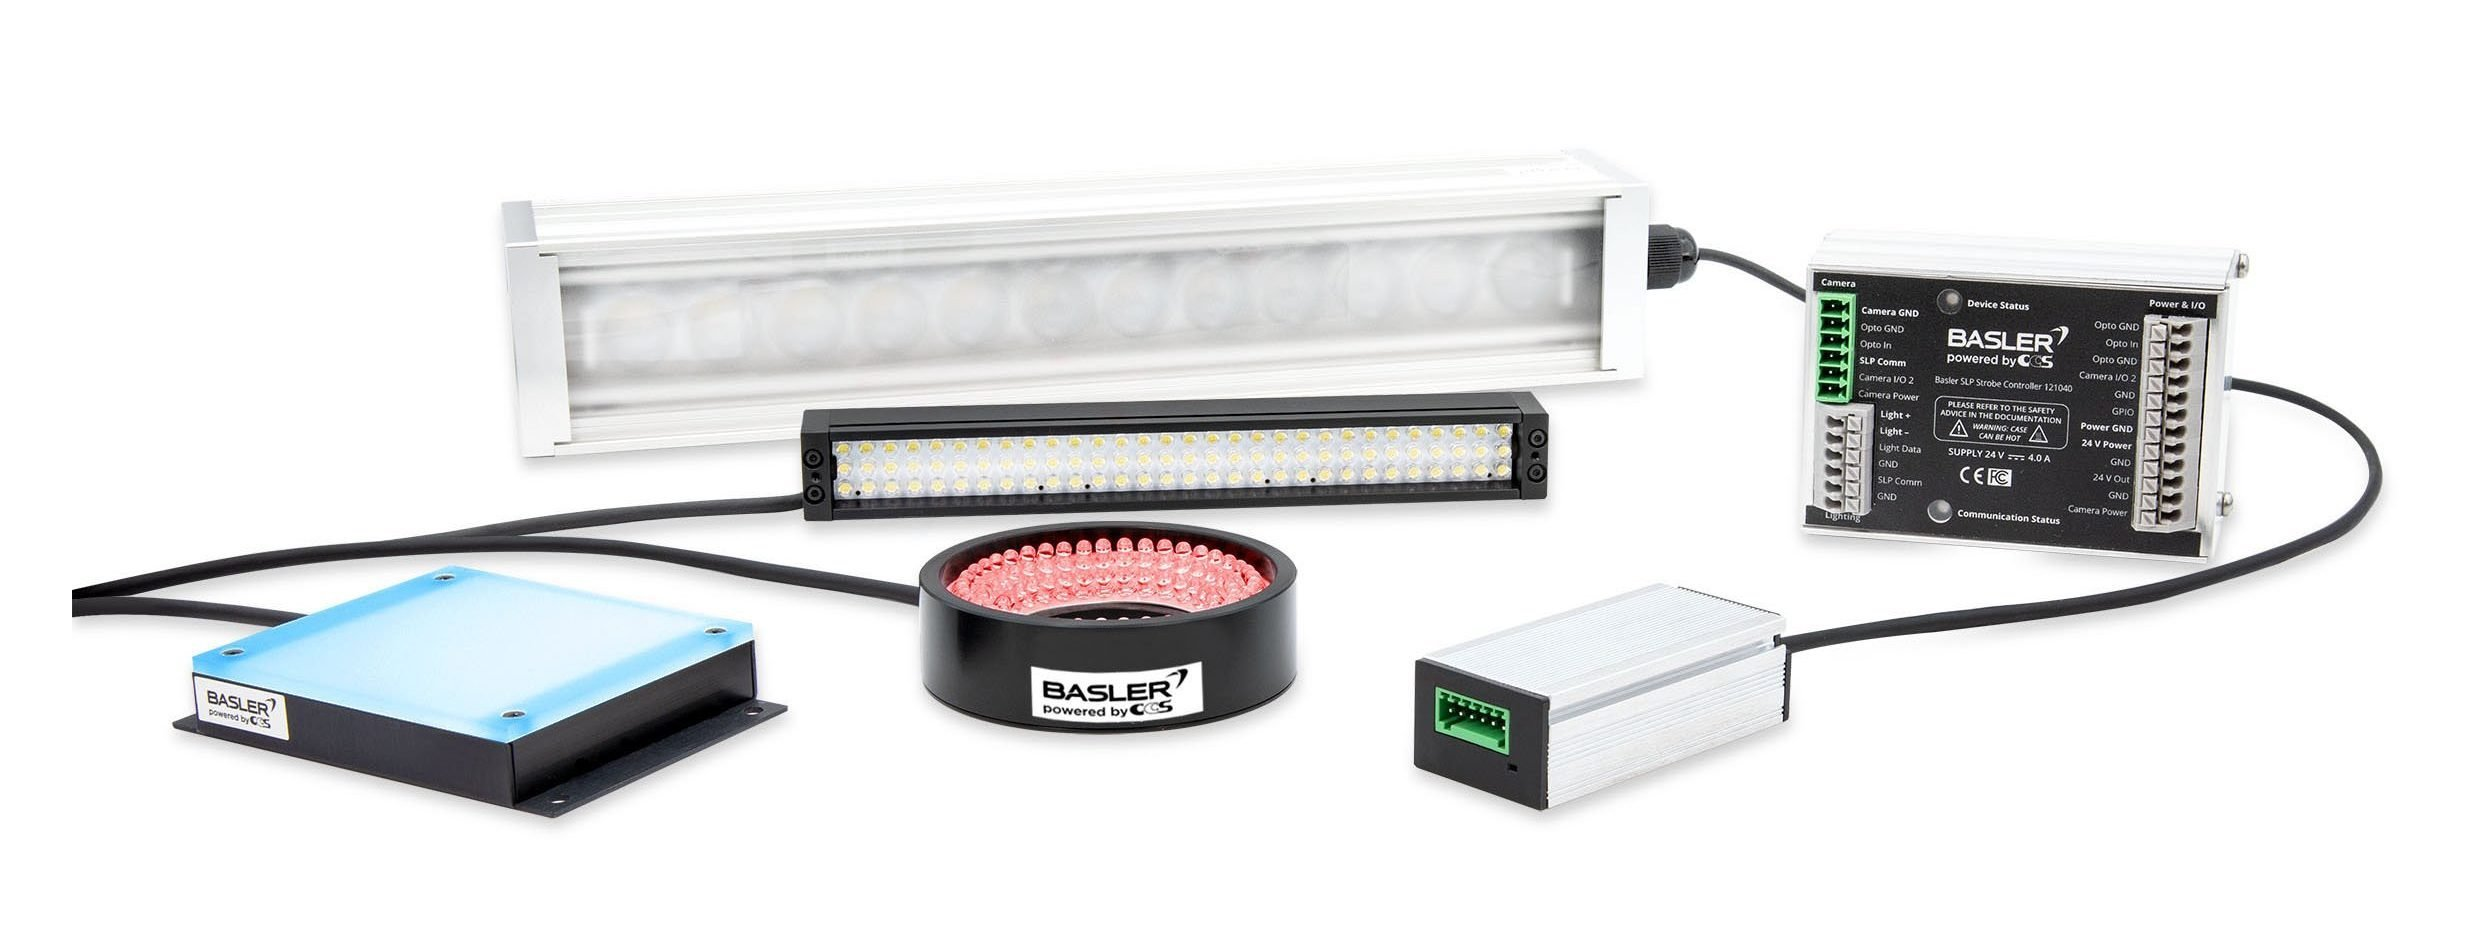 basler-lighting-solution-camera